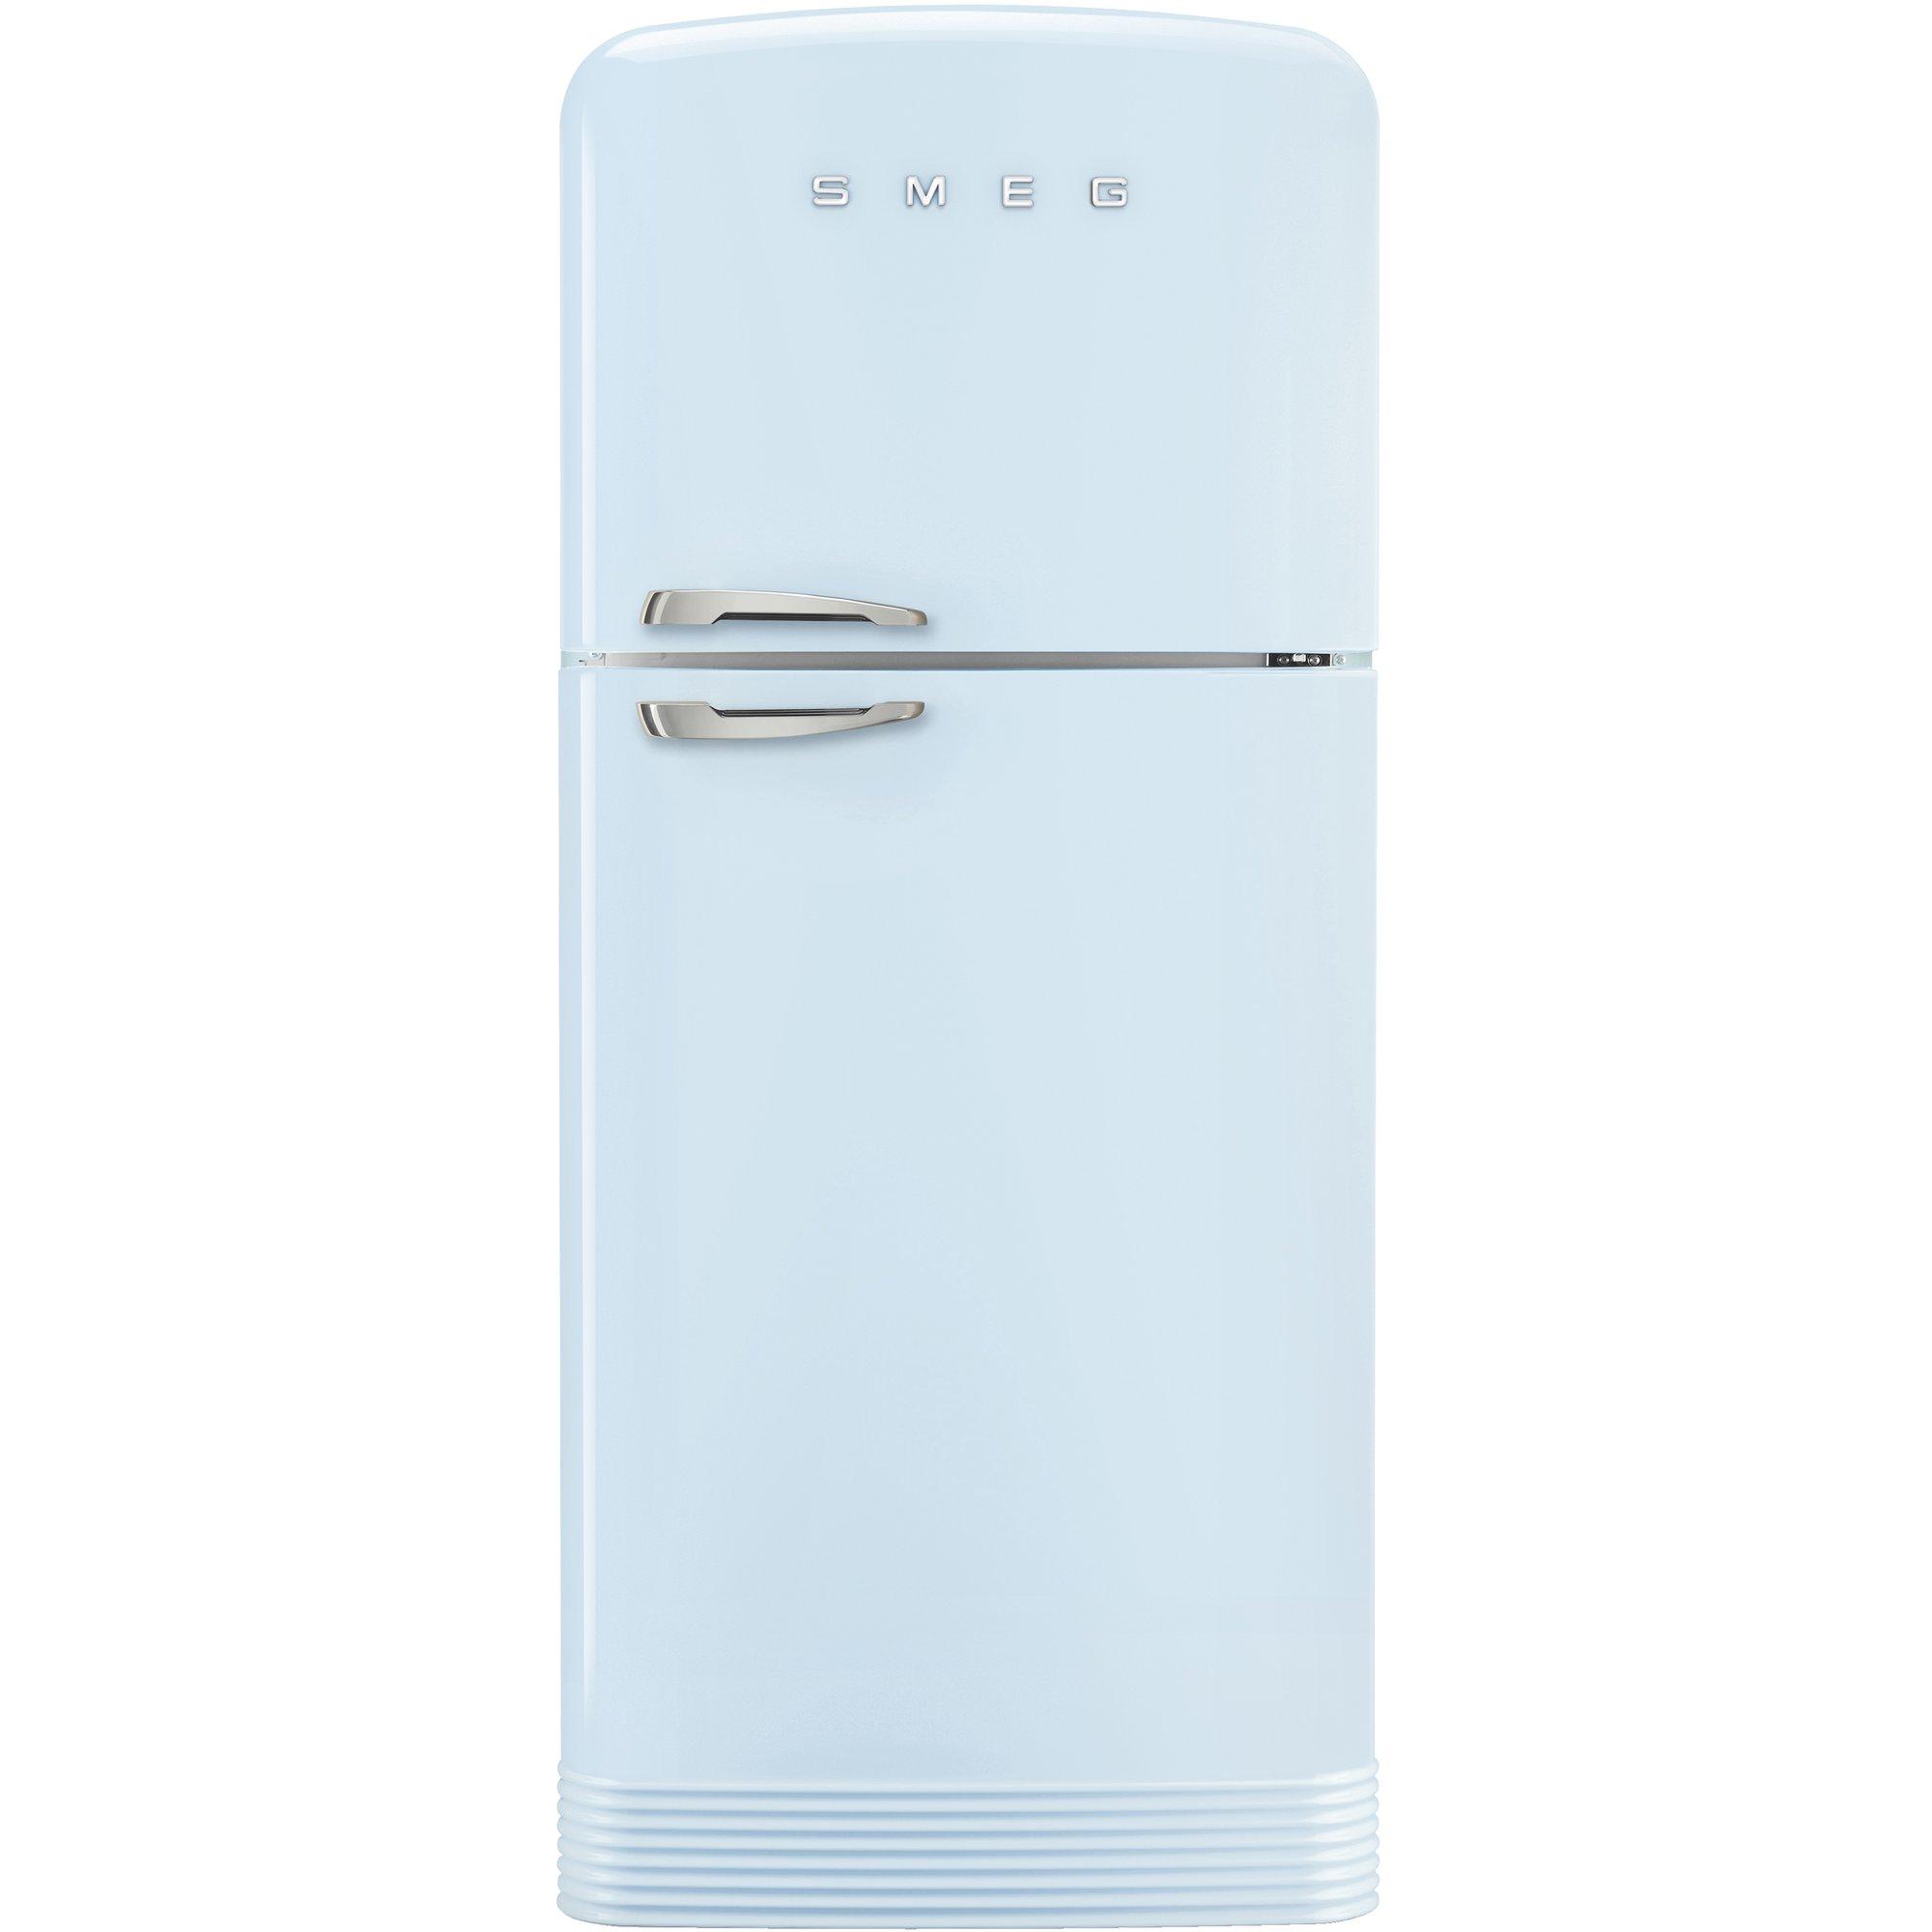 Smeg Kylskåp/frys i retrodesign högerhängt pastellblå